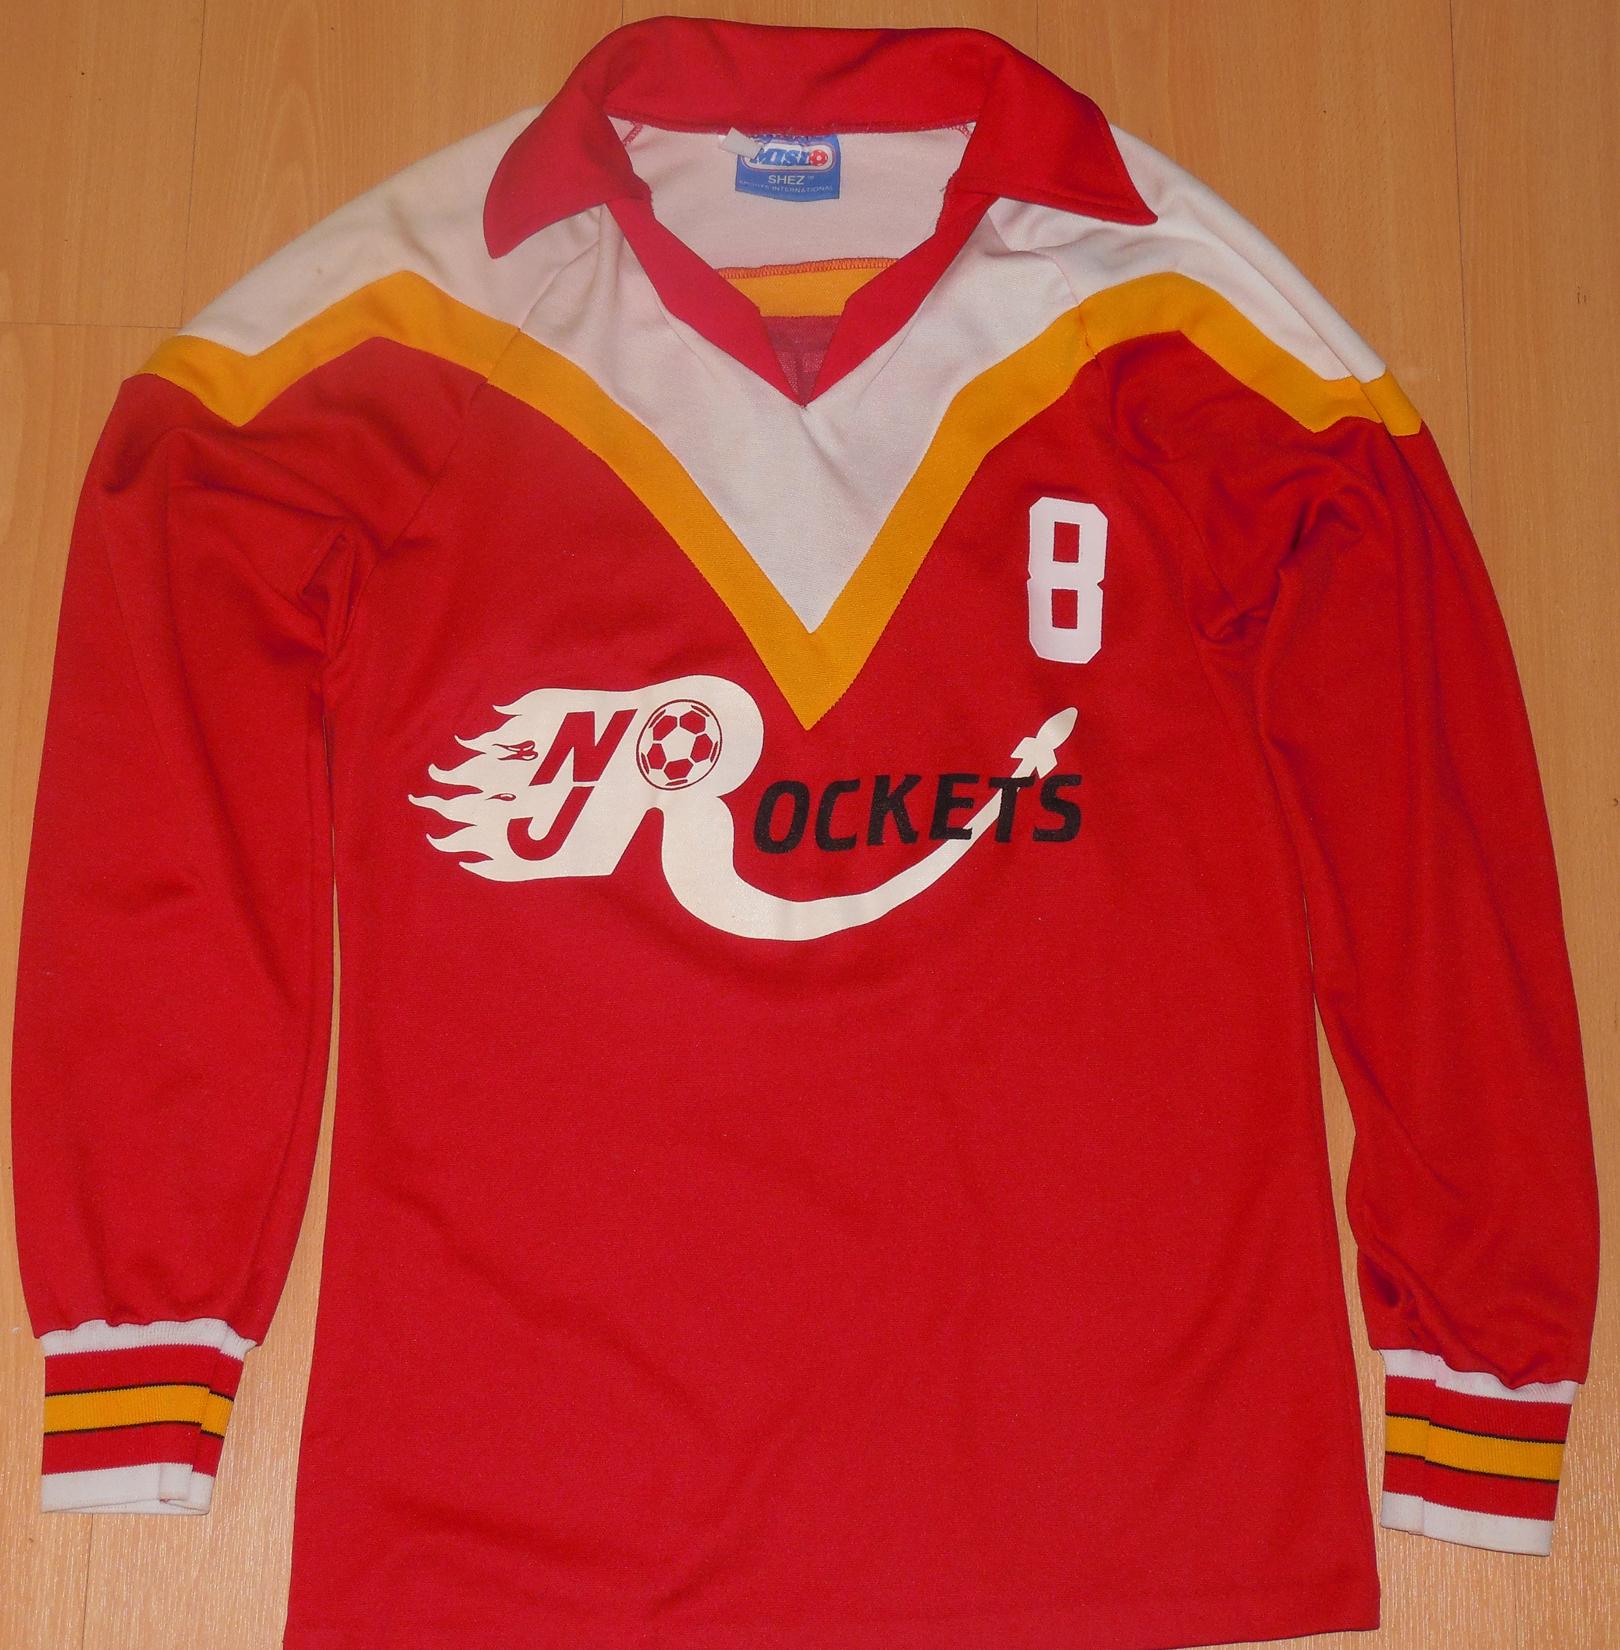 Rockets 81-82 Home Jersey Brian Alderson (1).JPG